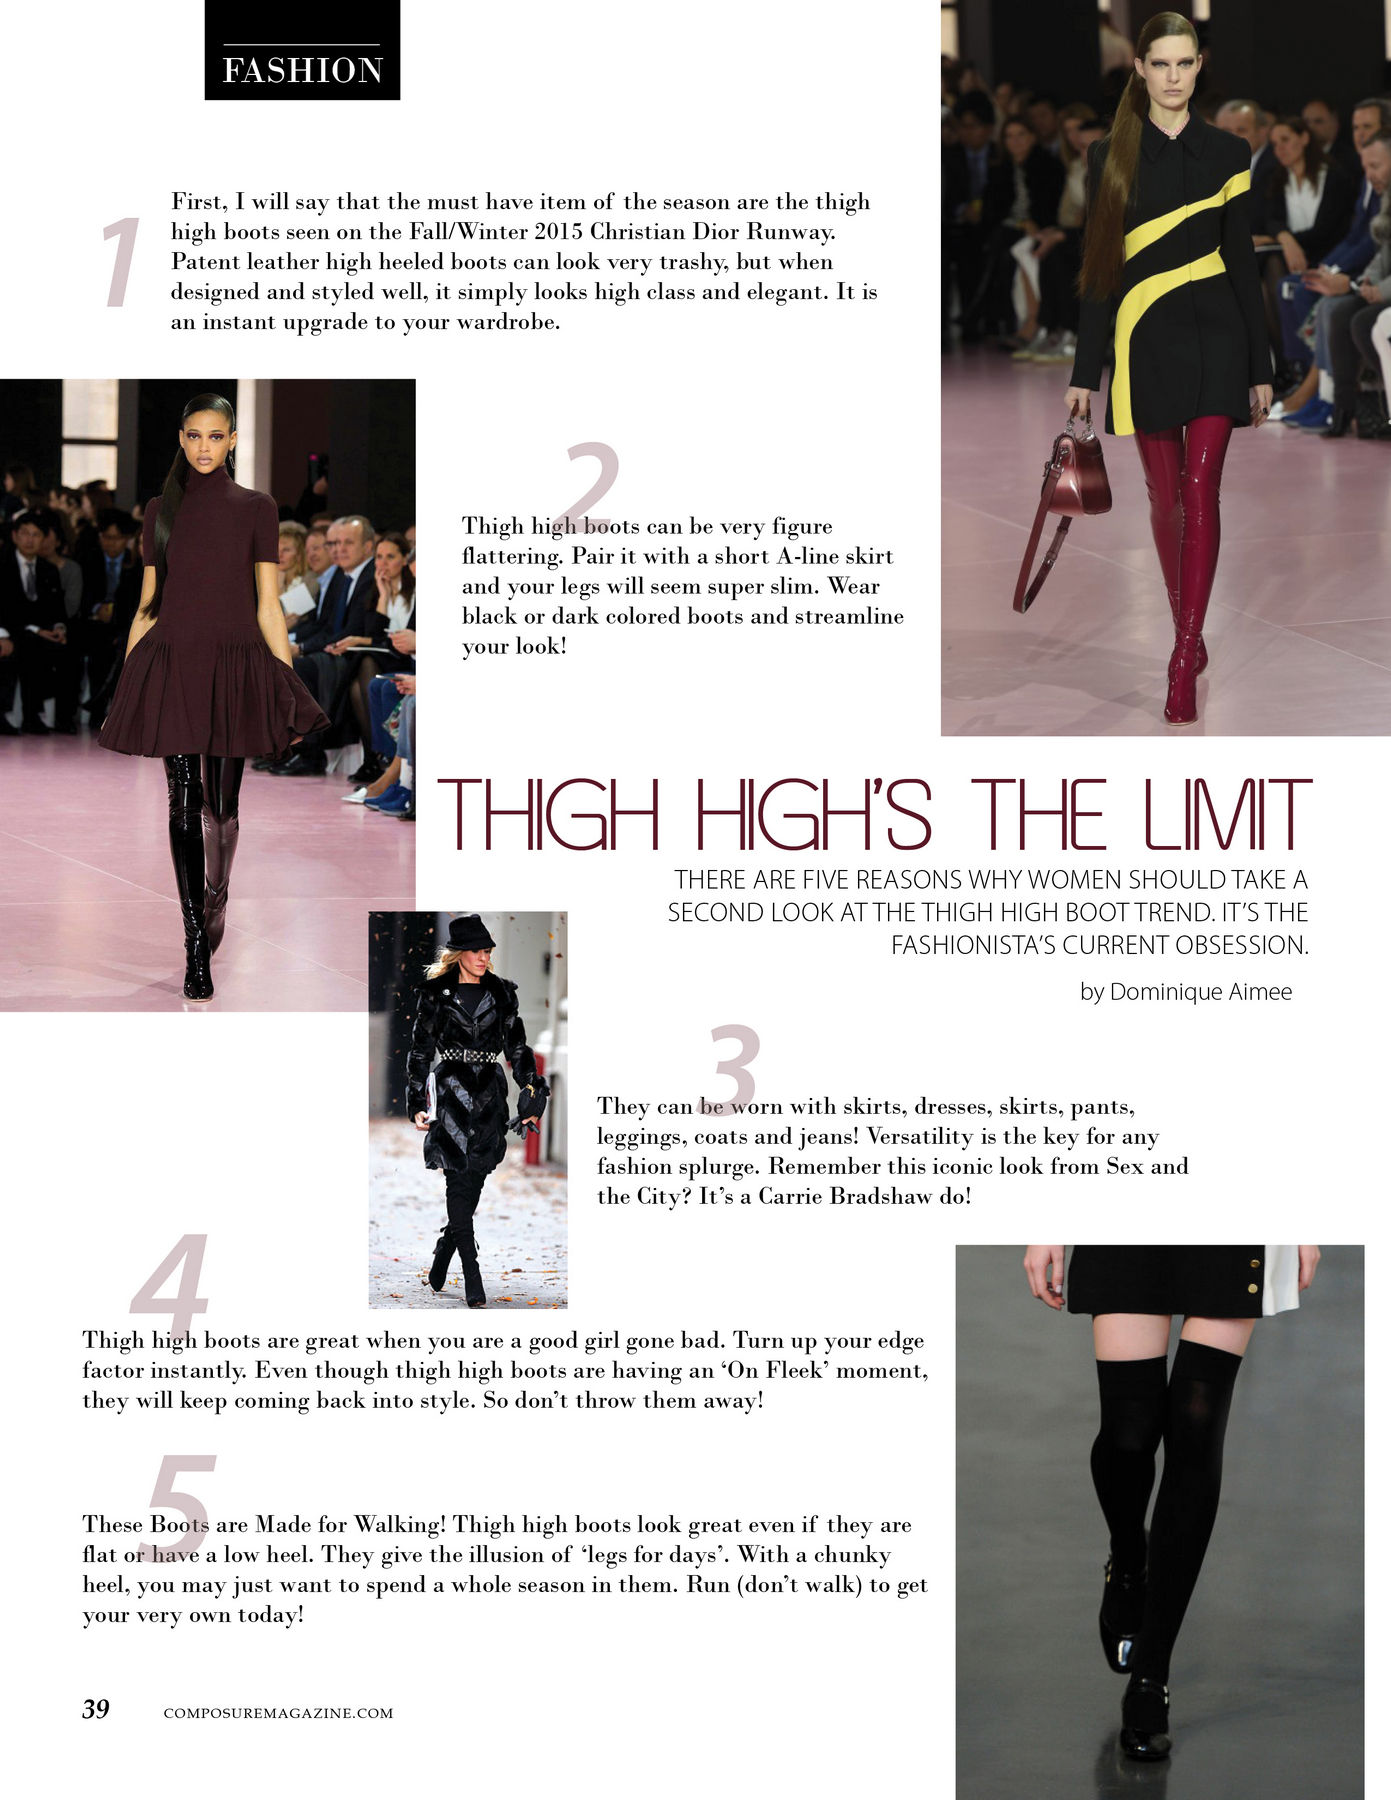 Fashion Advice: Thigh High's The Limit